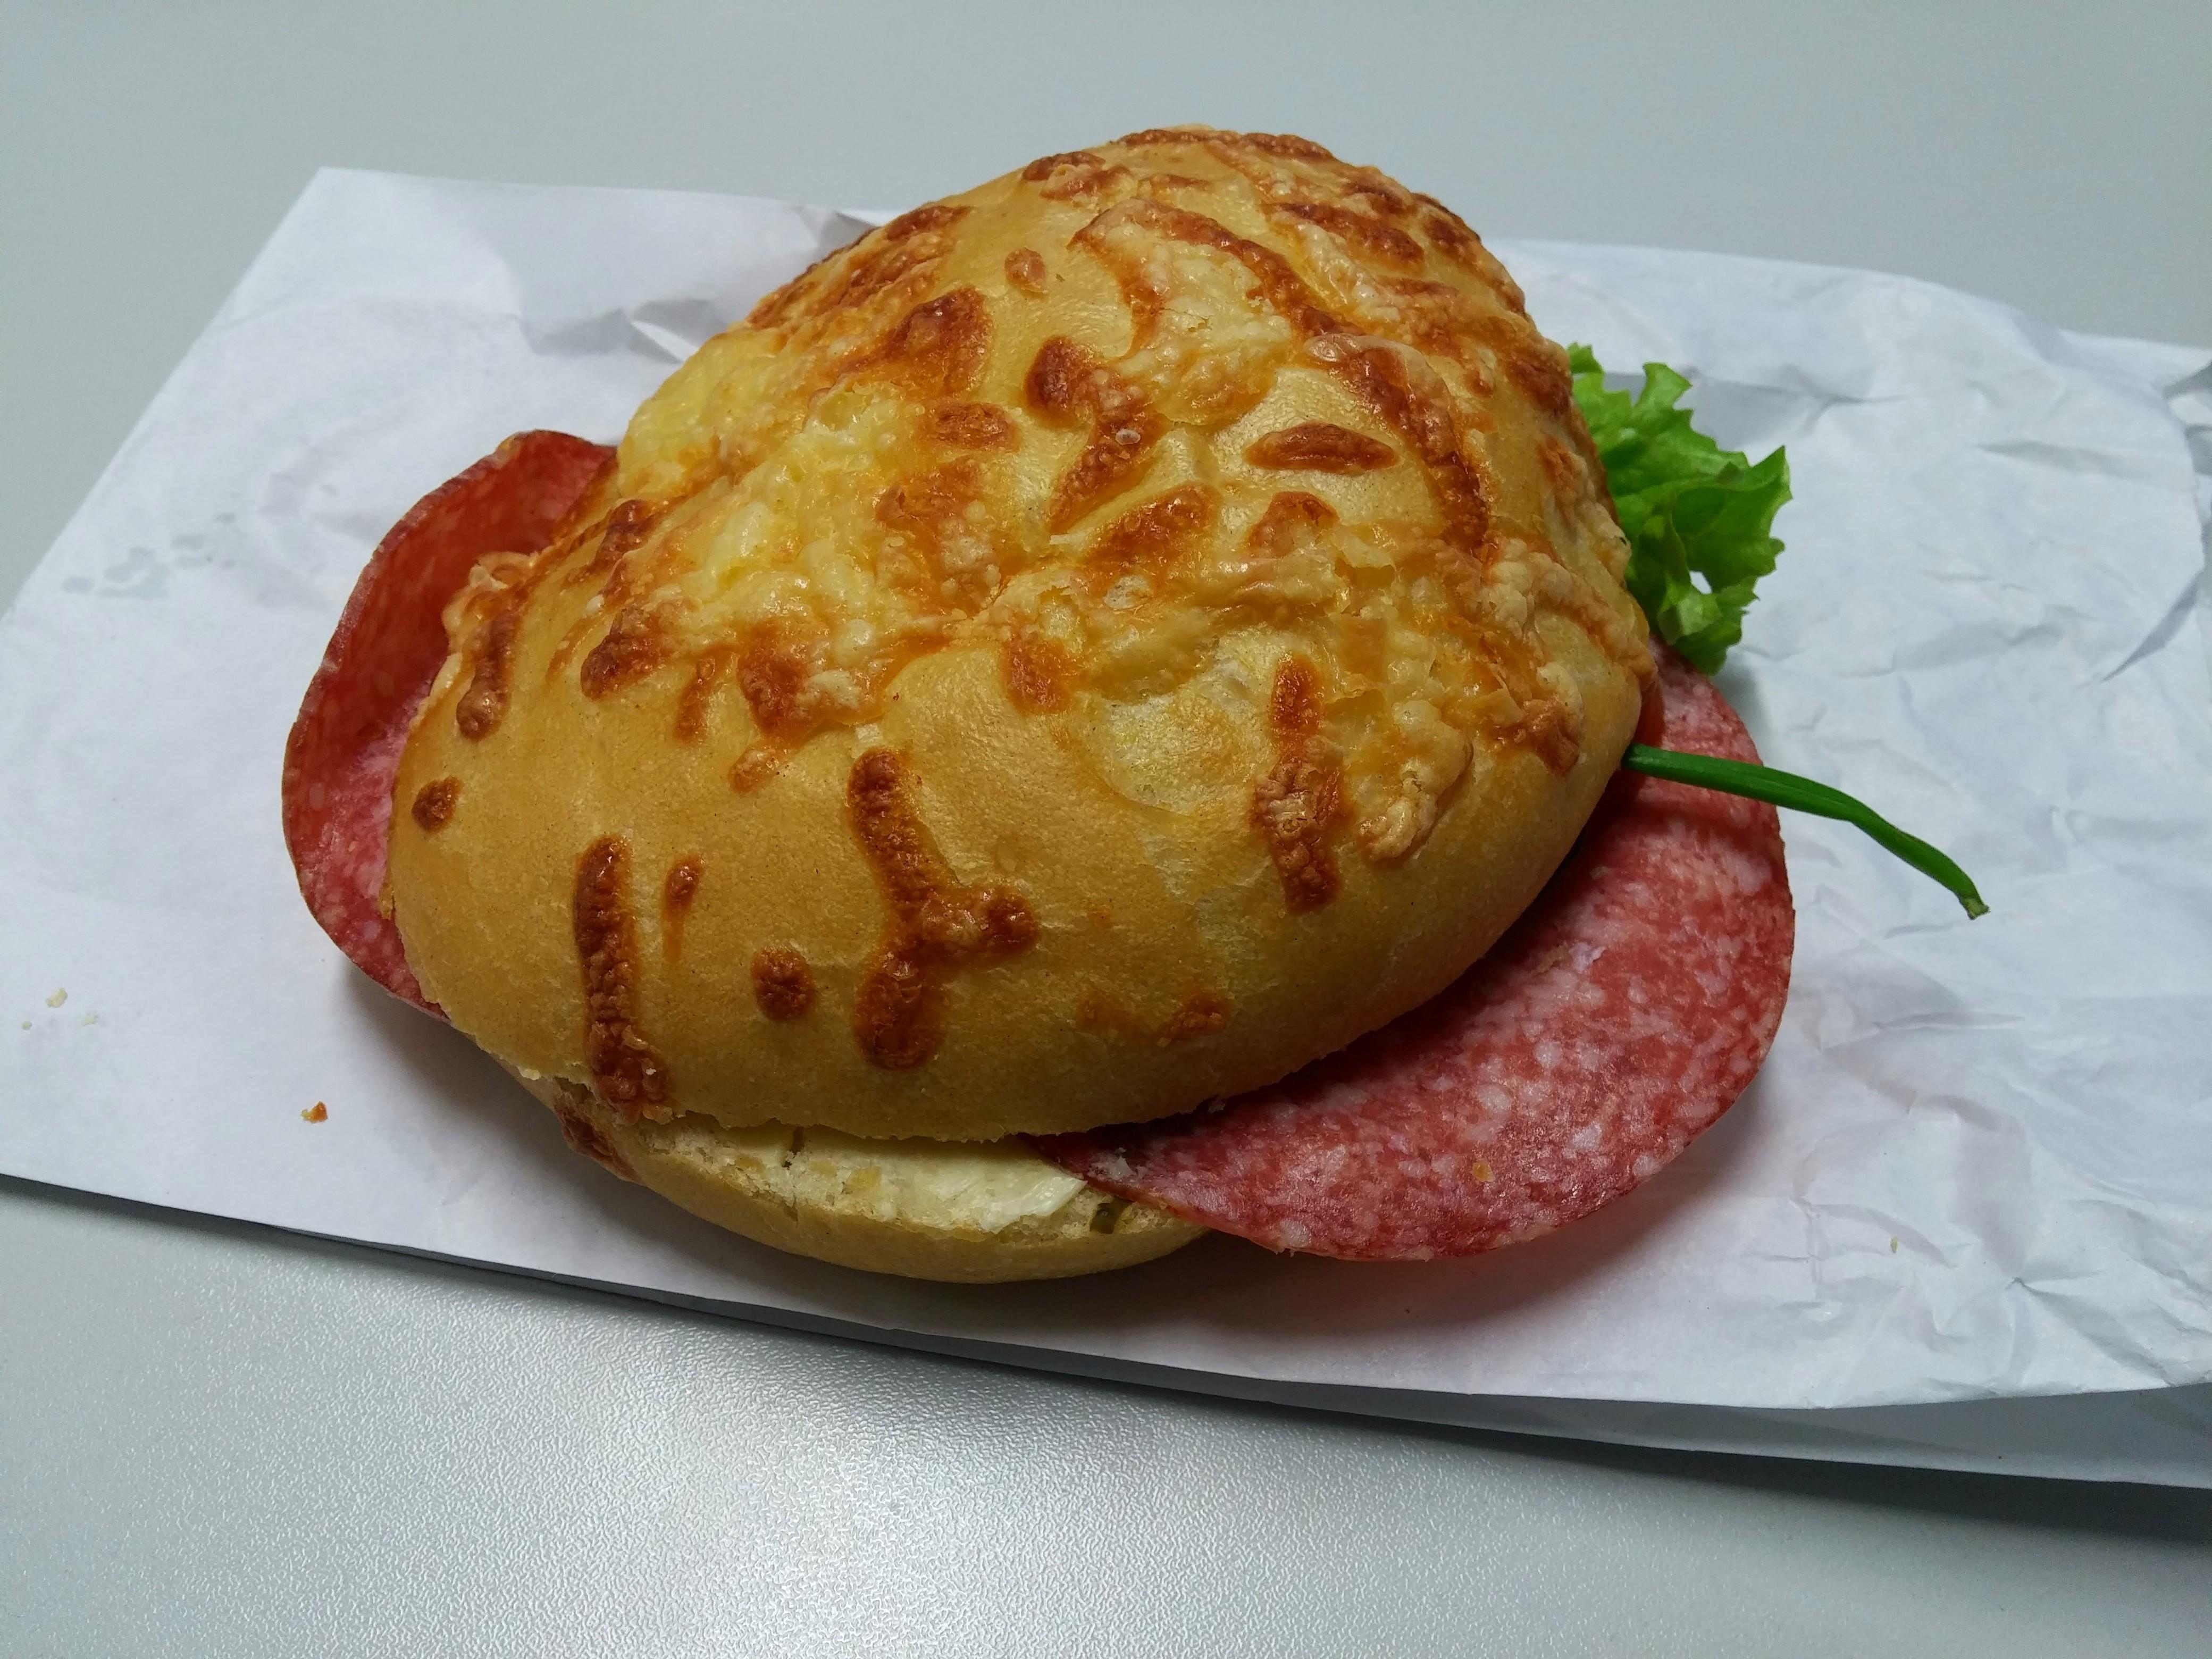 http://foodloader.net/nico_2014-12-05_belegtes-broetchen.jpg